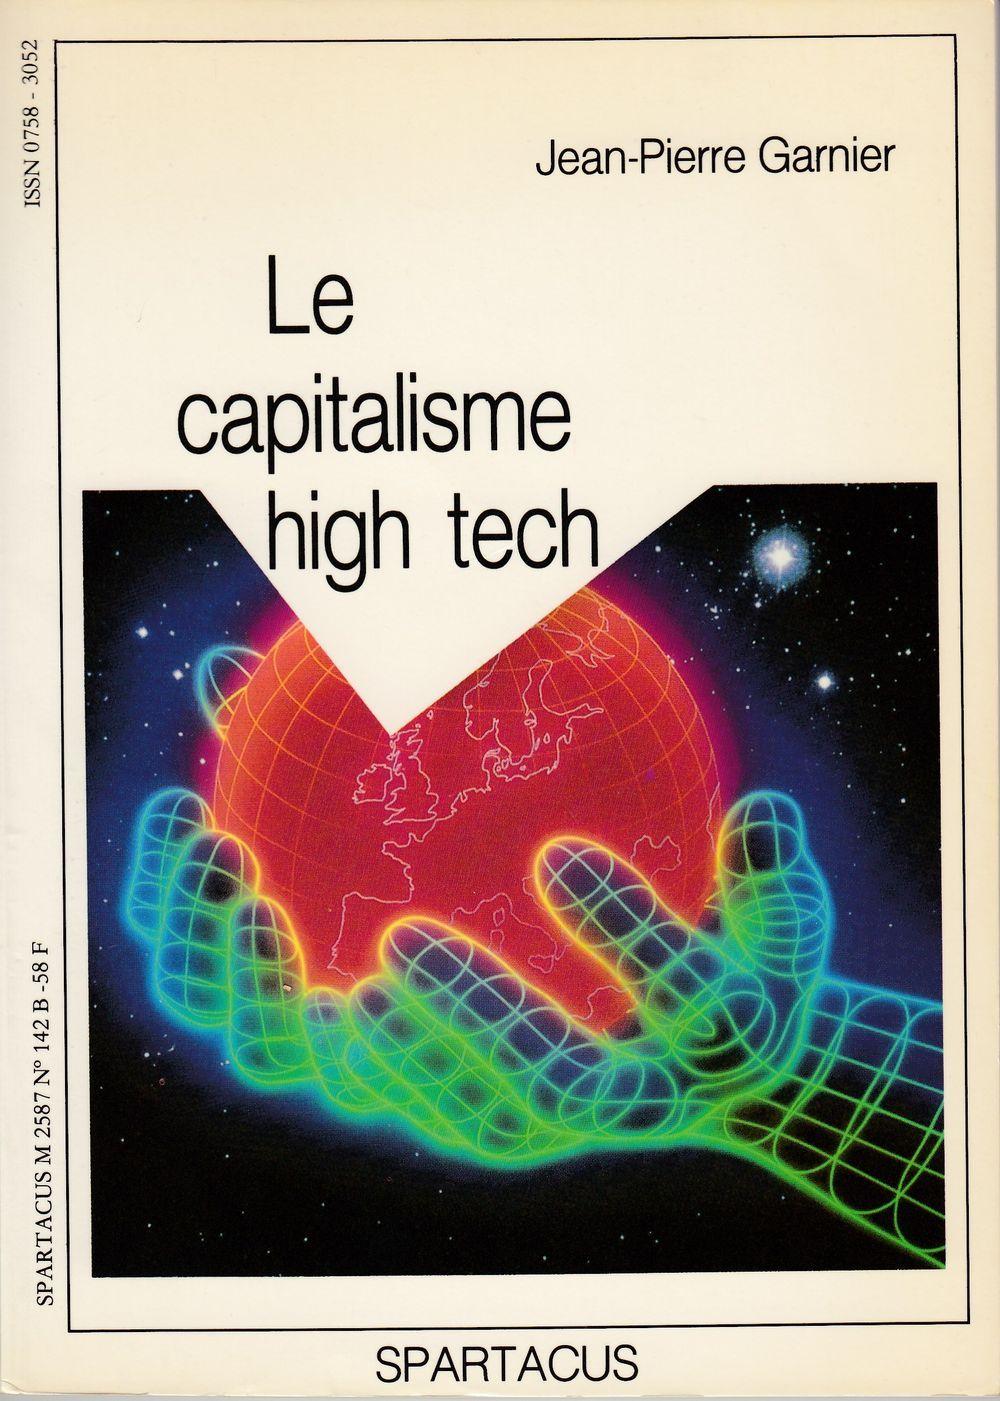 LE CAPITALISME HIGH TECH